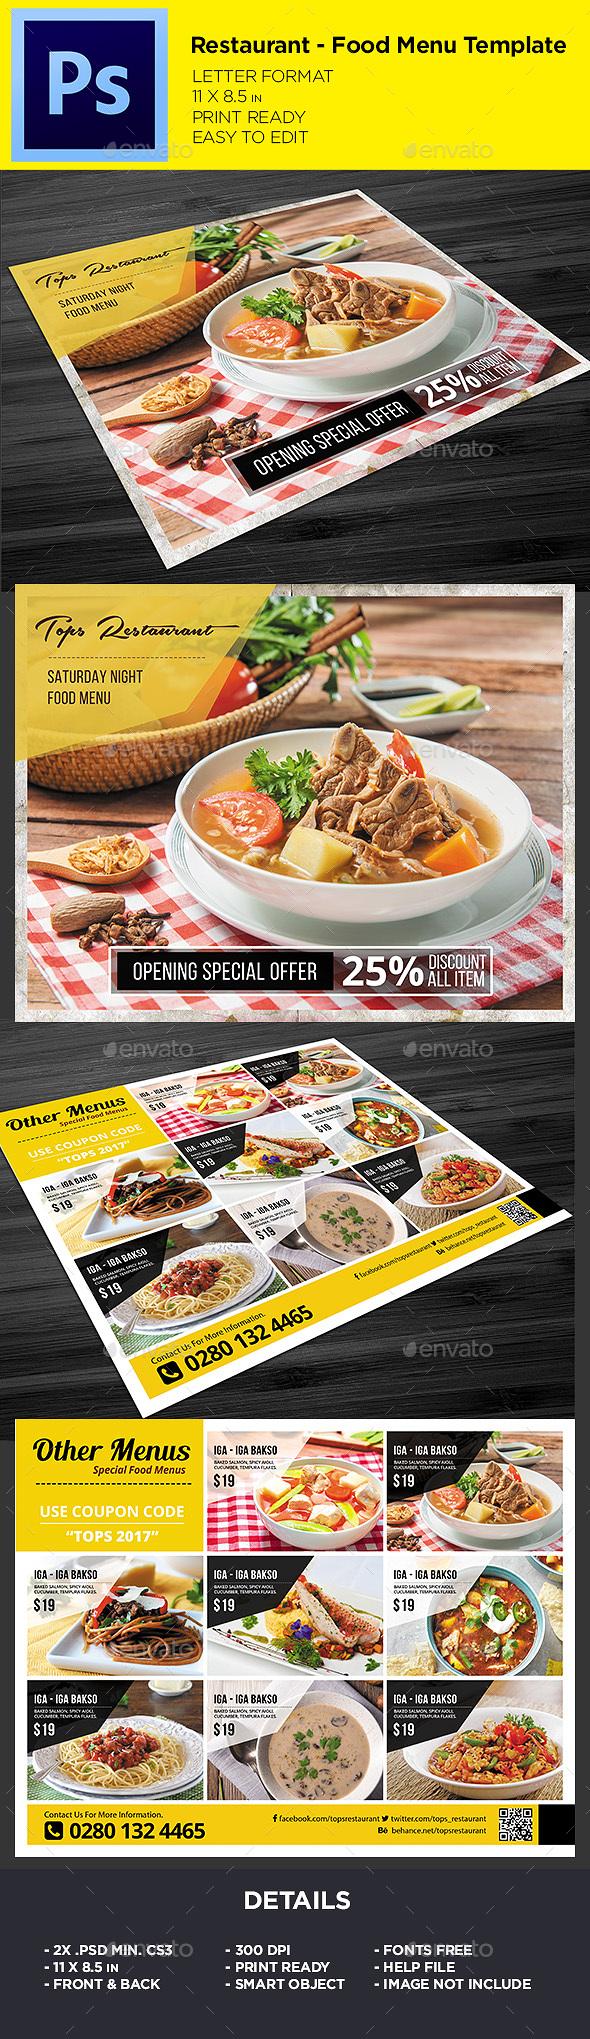 Restaurant Menu - Food Menu Flyer - Restaurant Flyers